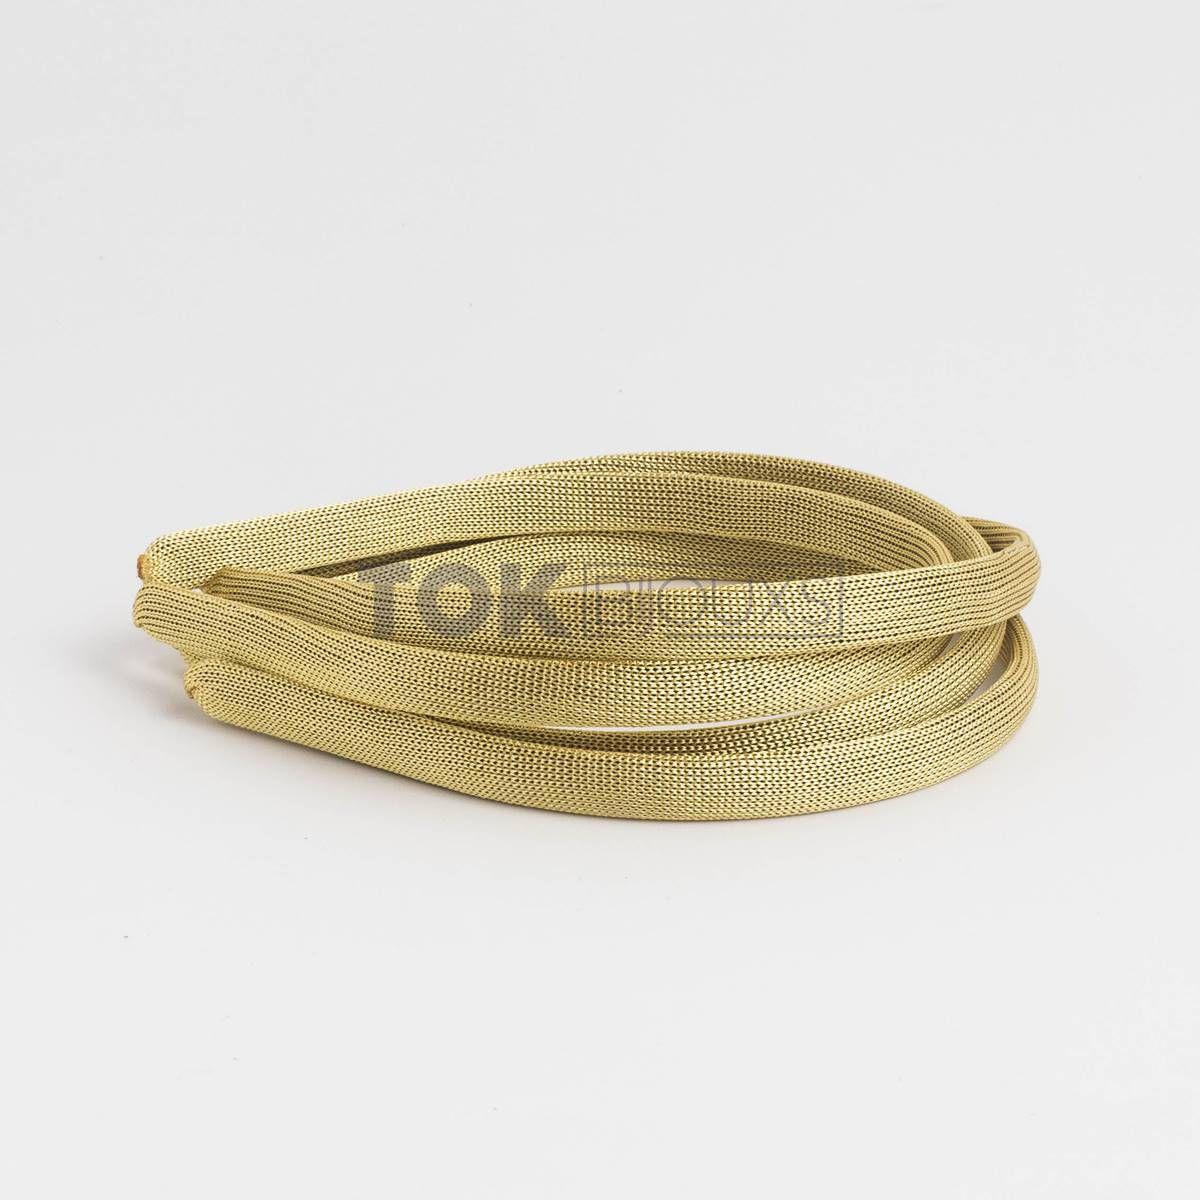 Tiaras Encapadas 10mm - Dourado - 12Unid